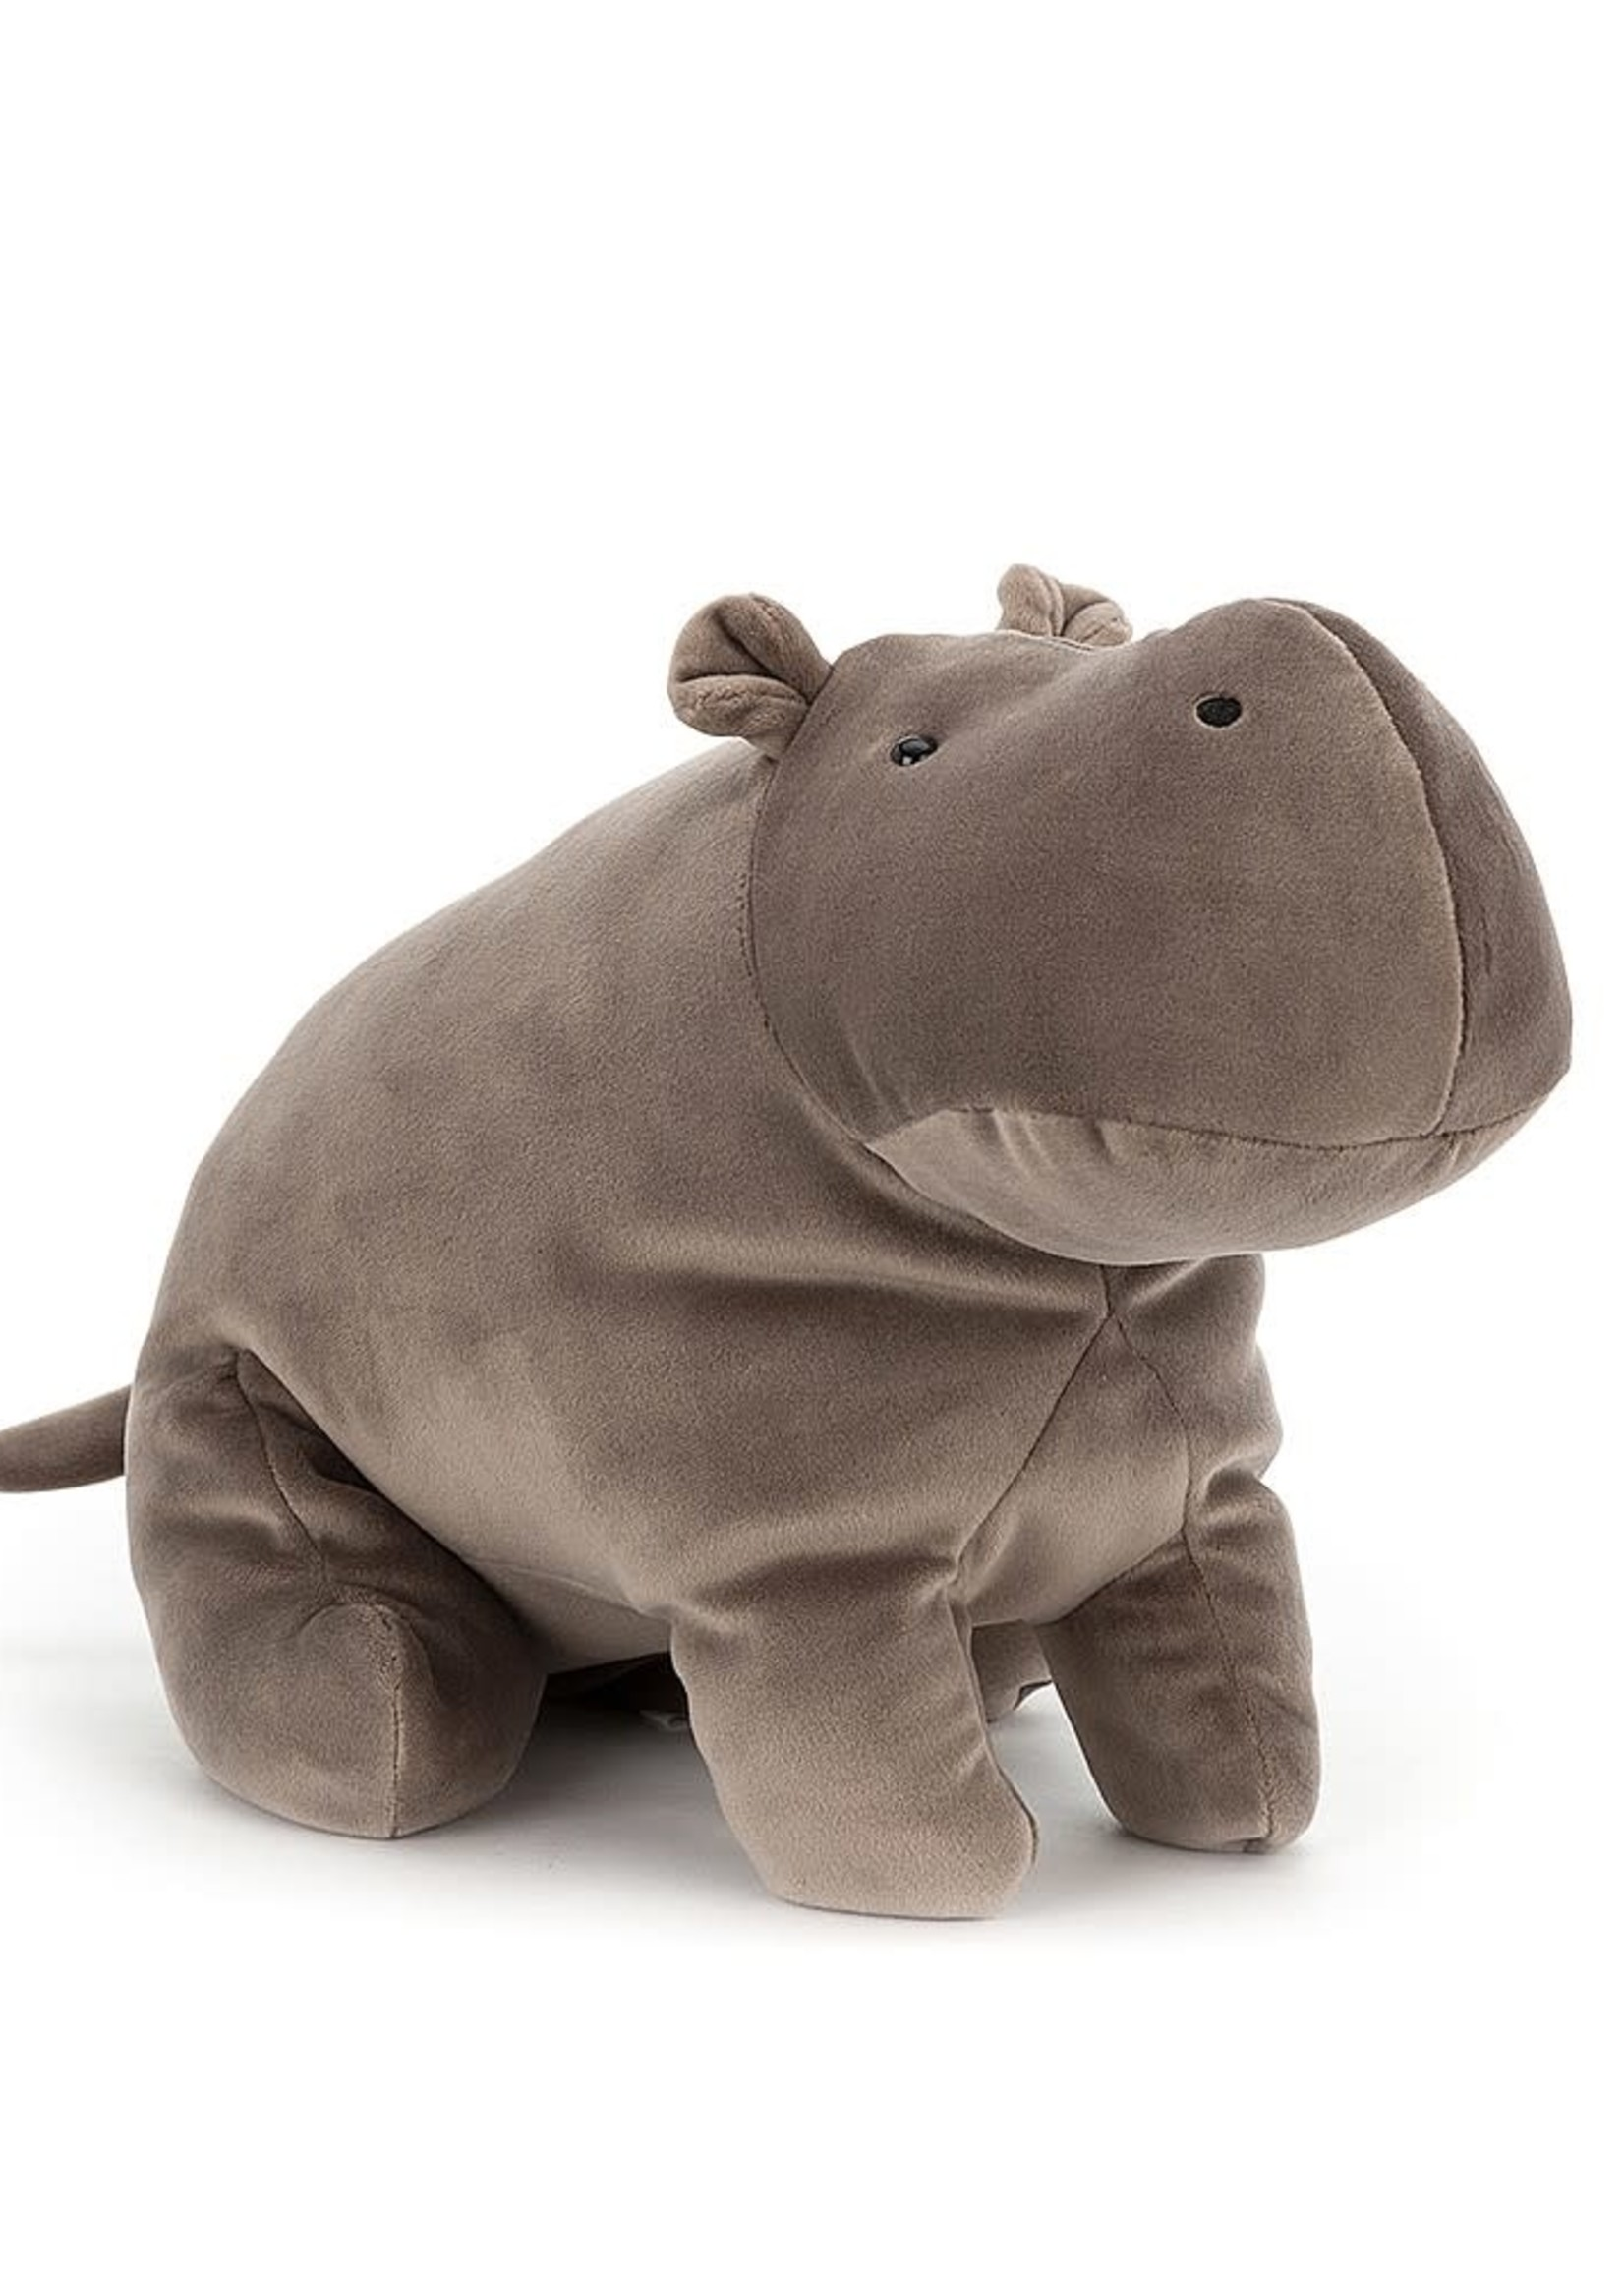 JELLYCAT JELLYCAT MARSHMALLOW HIPPO